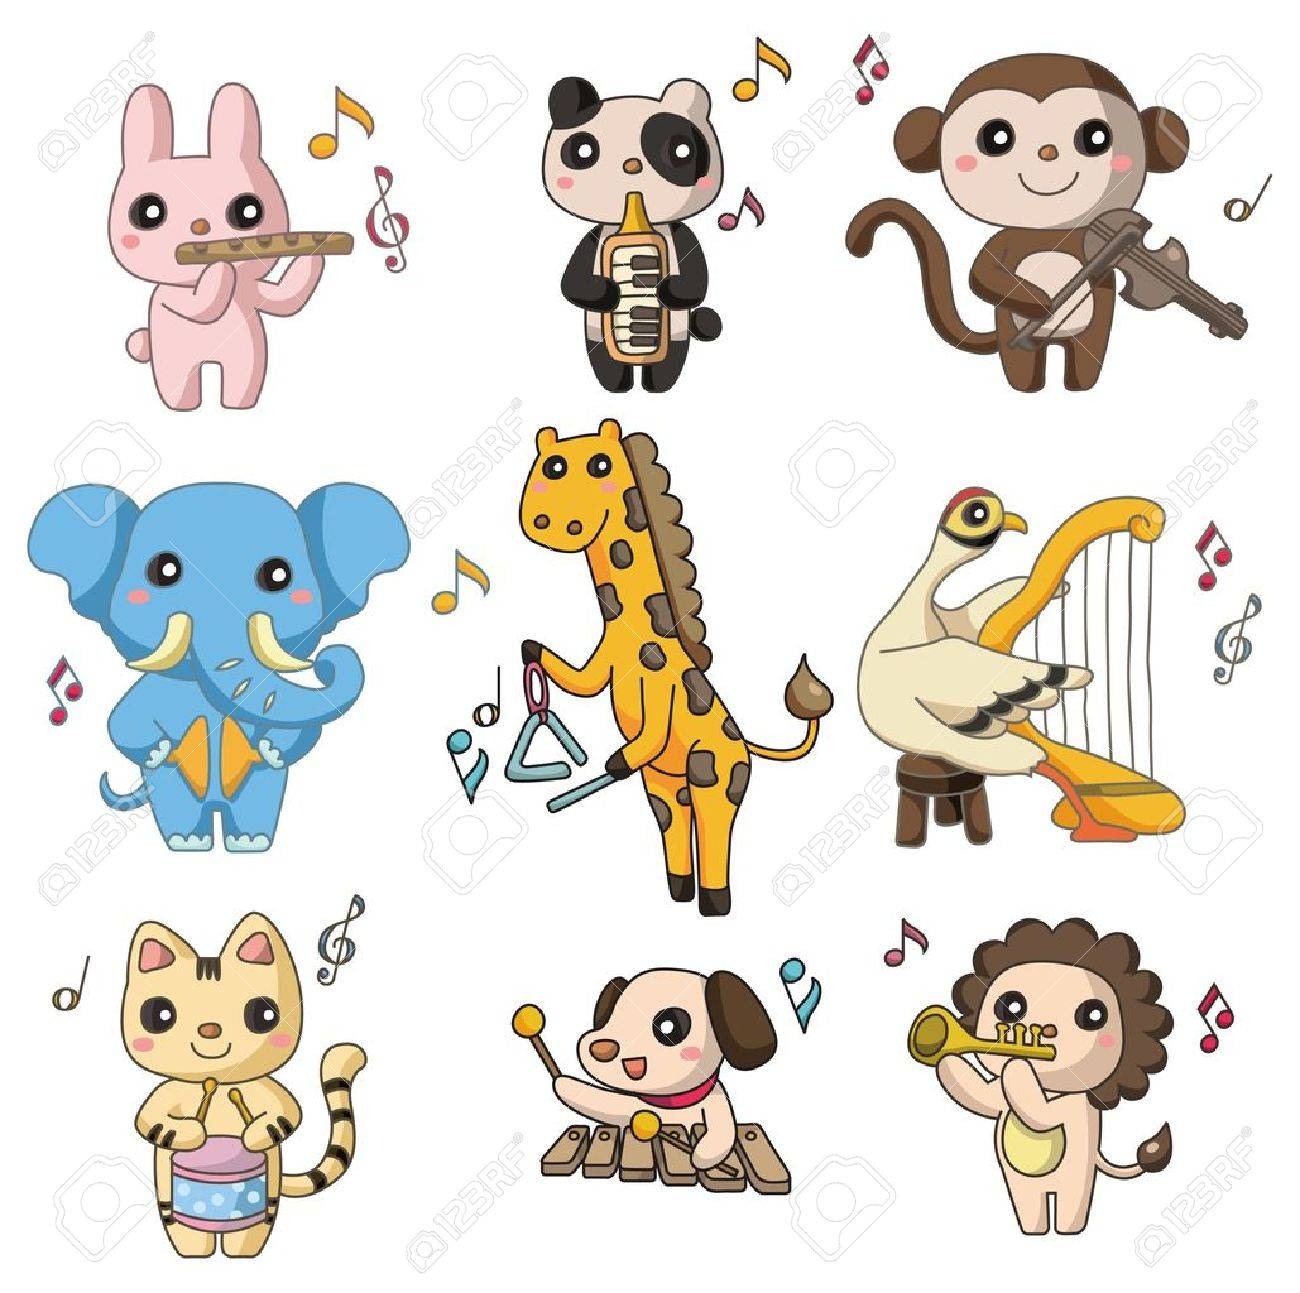 cartoon animal play music  icon Stock Vector - 9221317